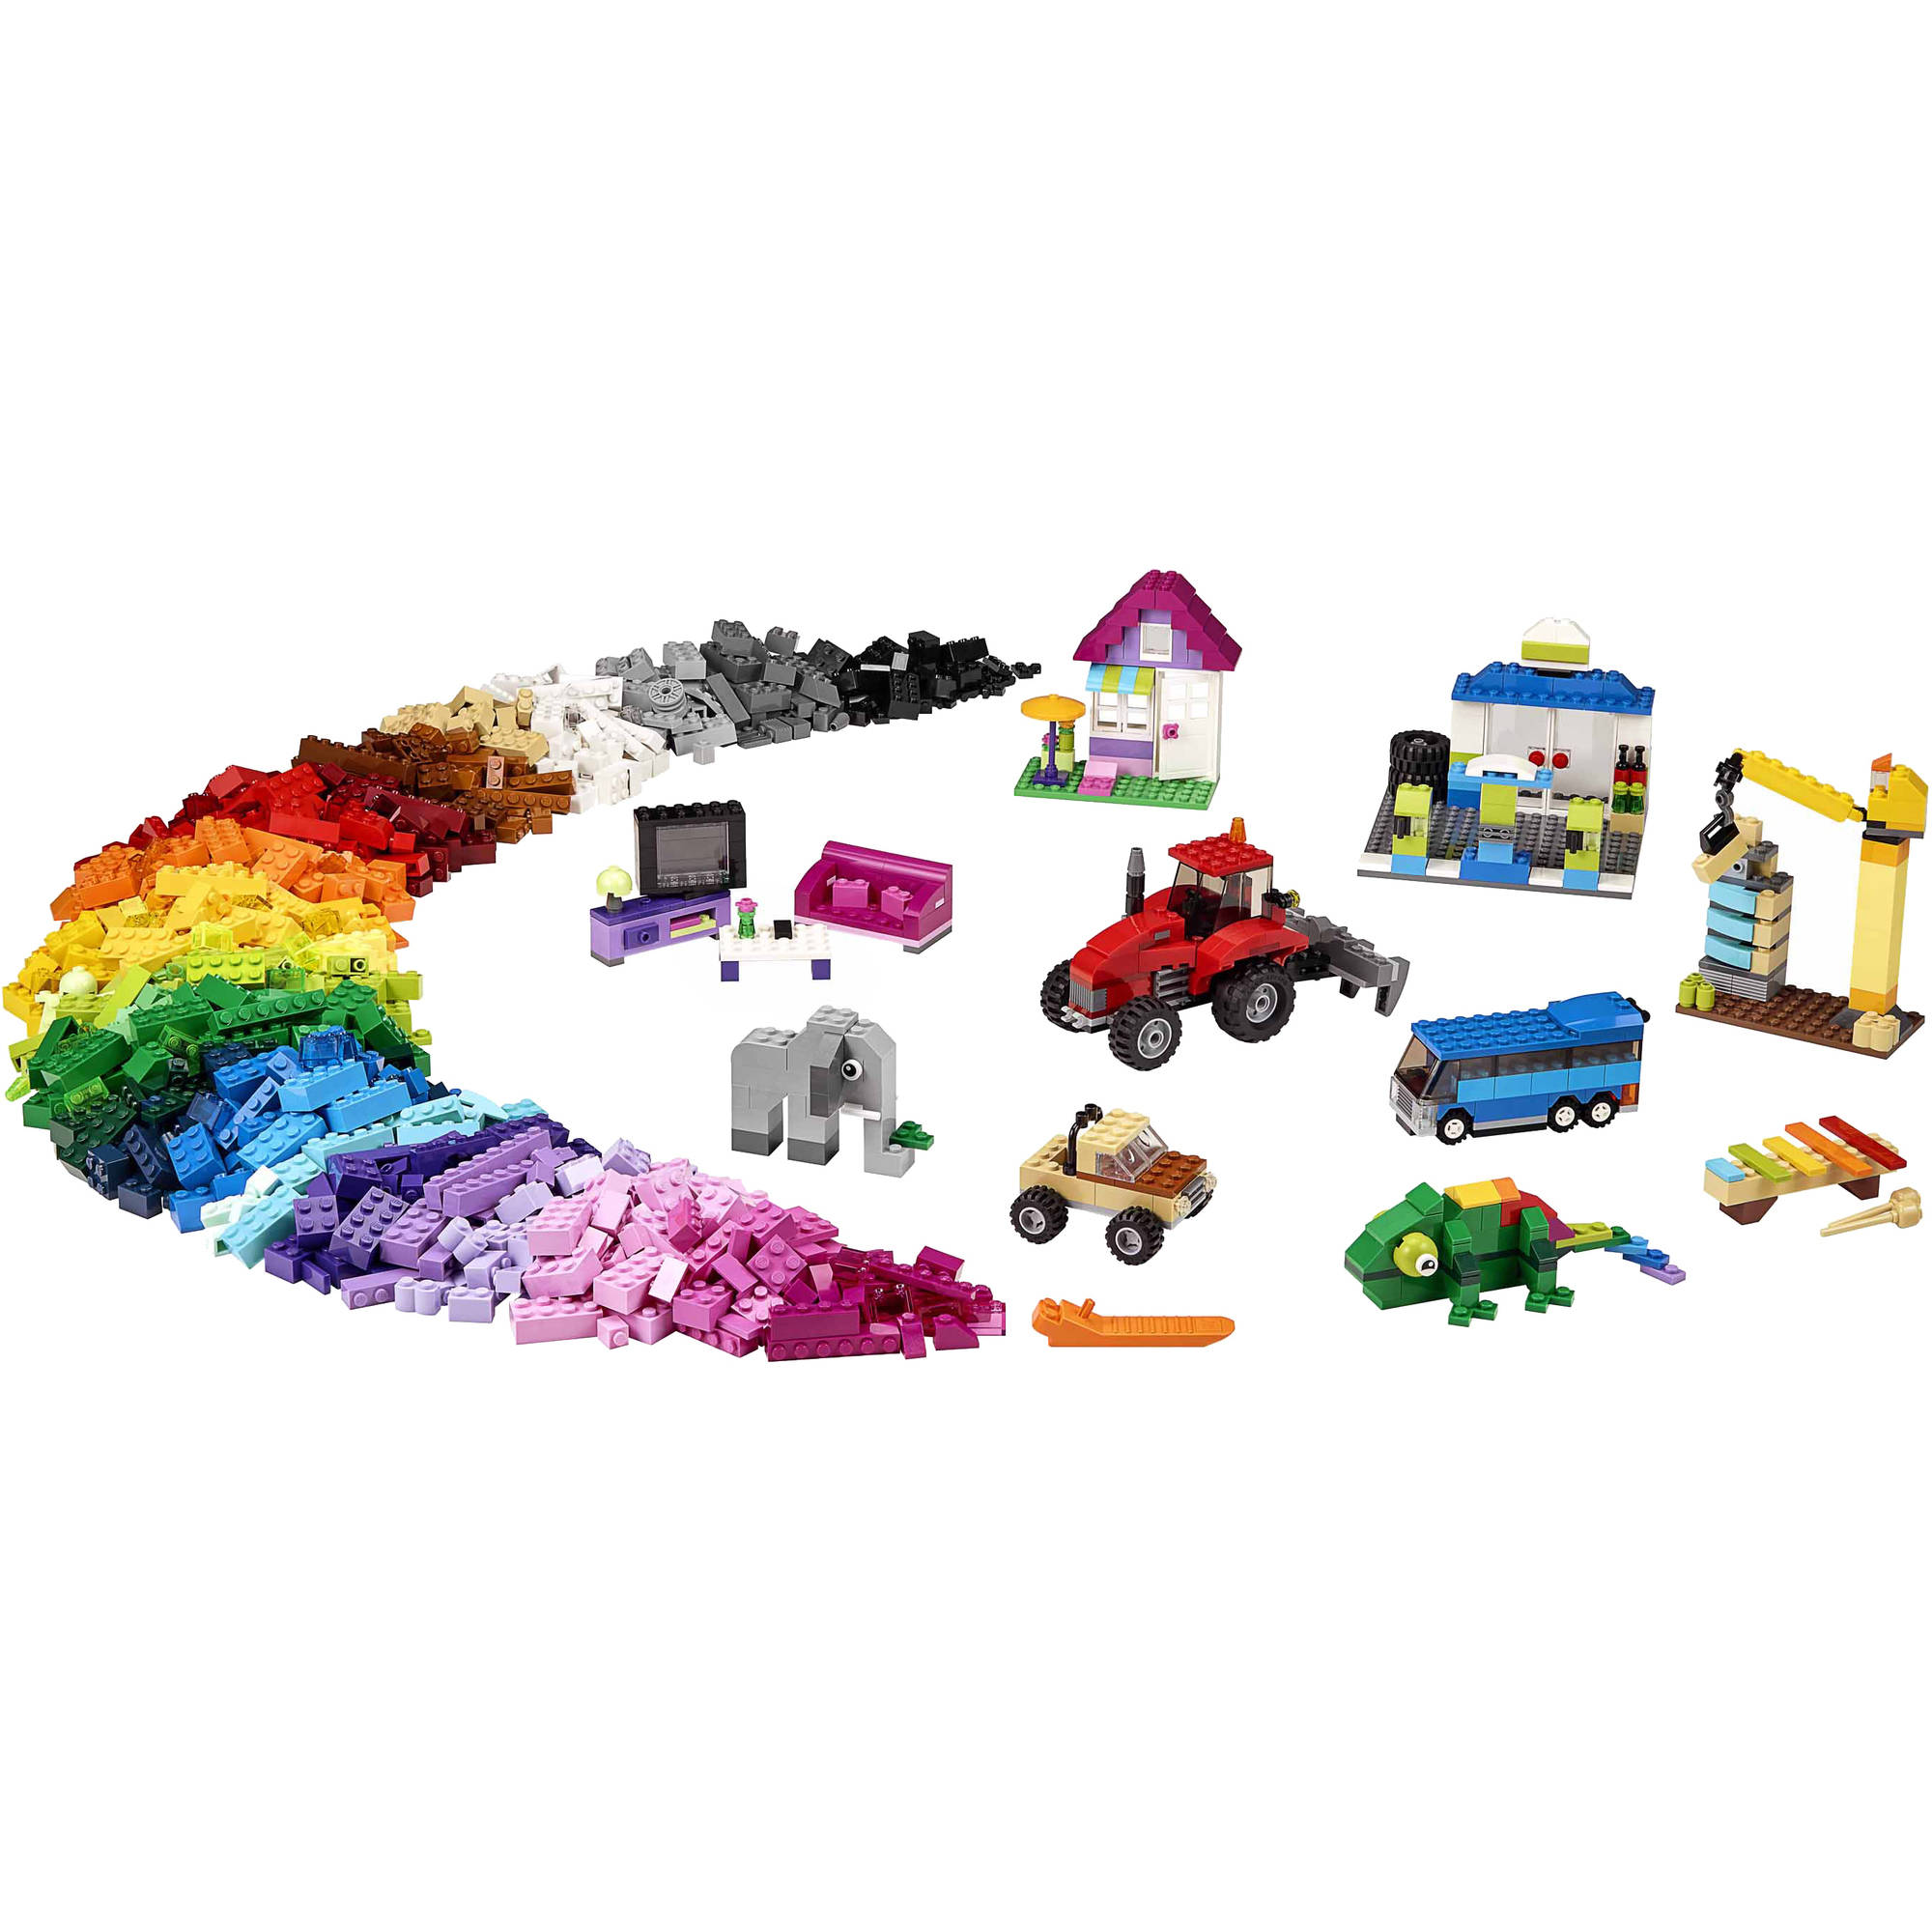 LEGO Classic Large Creative Box - Walmart.com